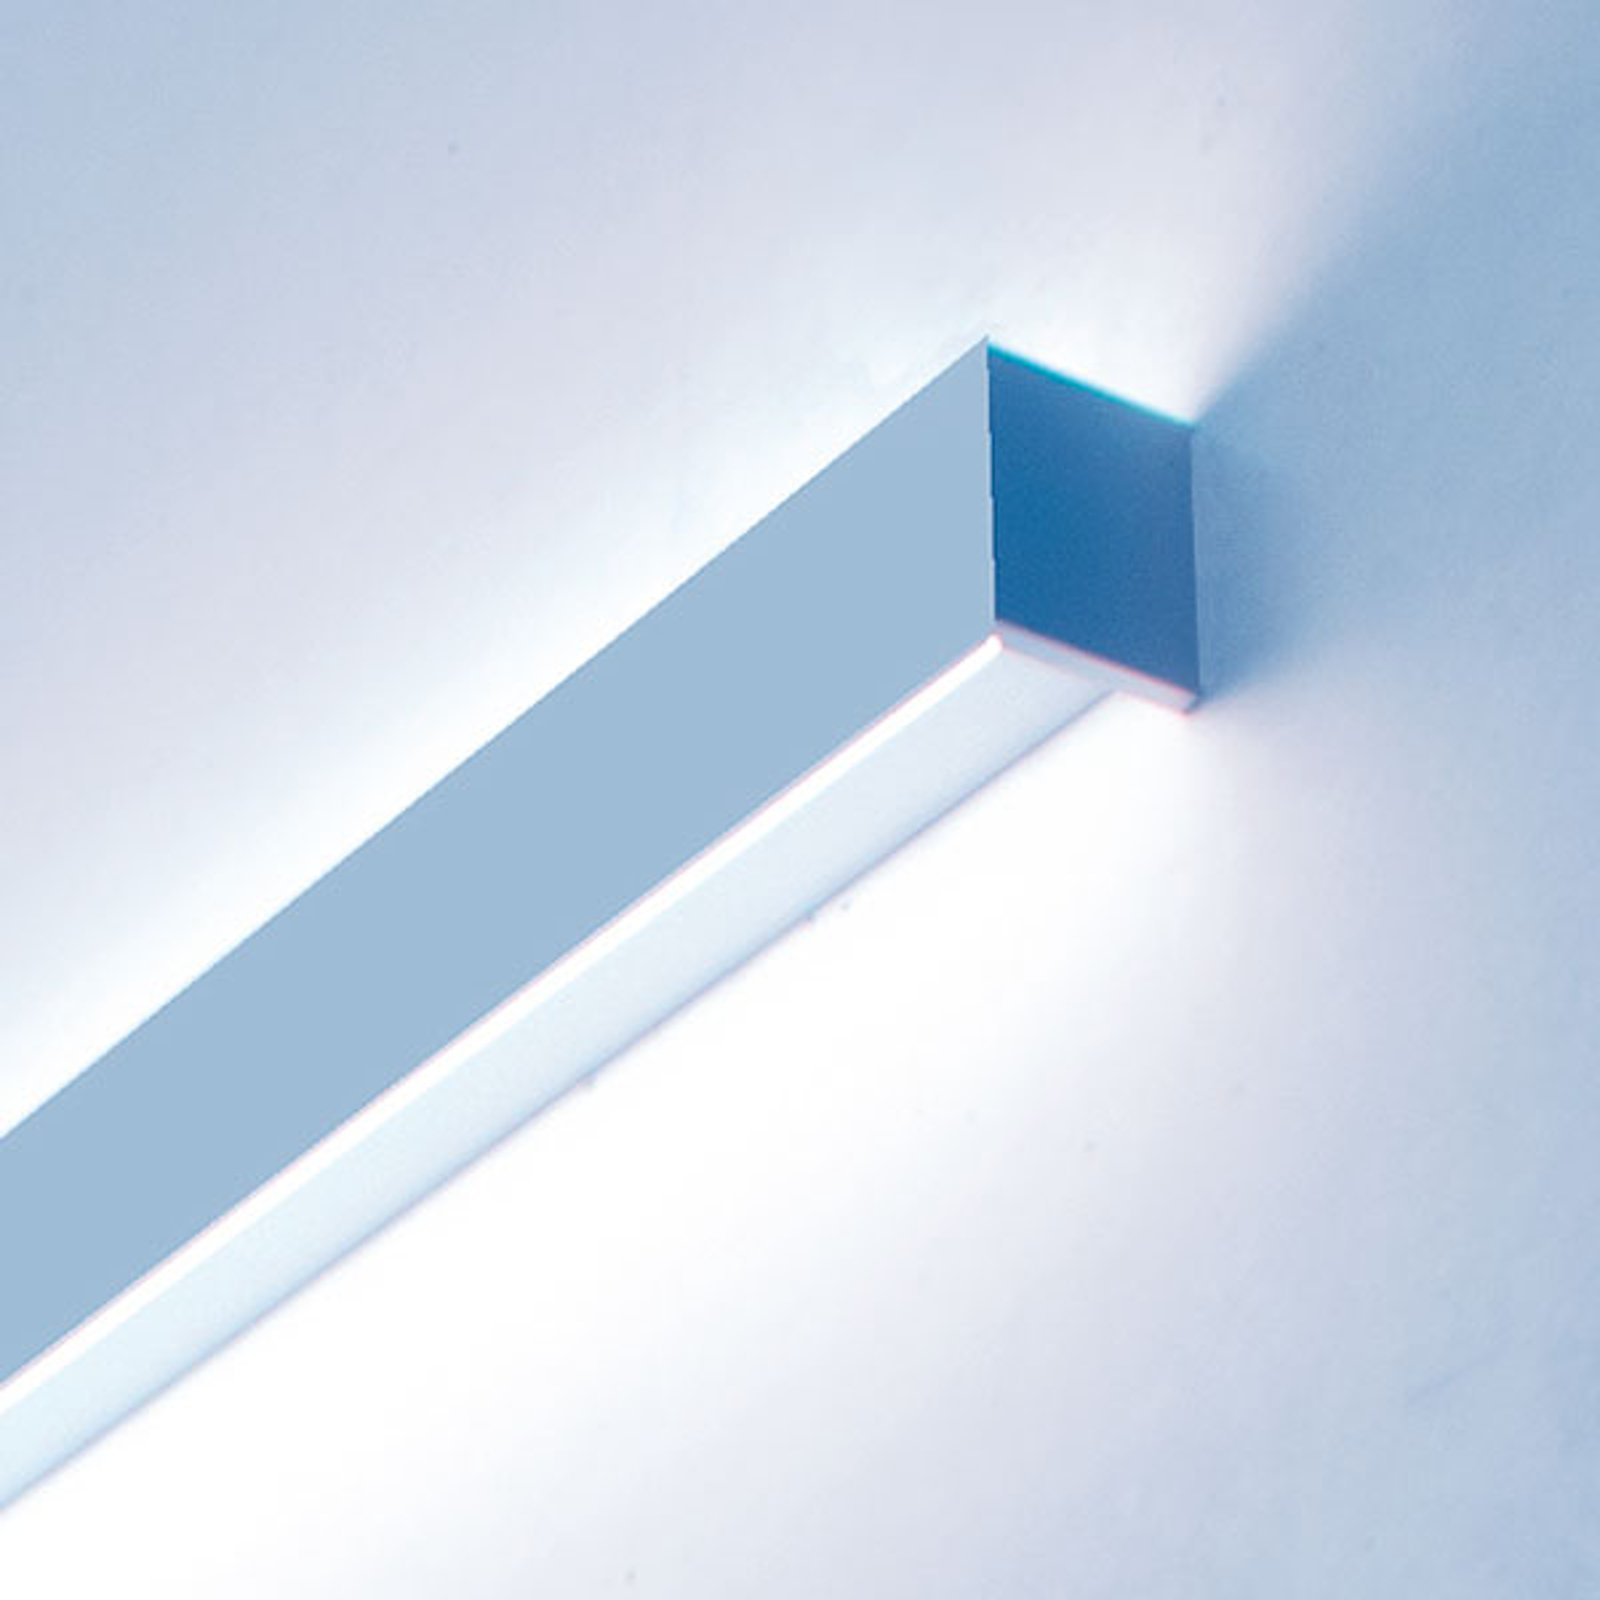 Matric W1 LED-vegglampe i 235 cm, 4 000 K